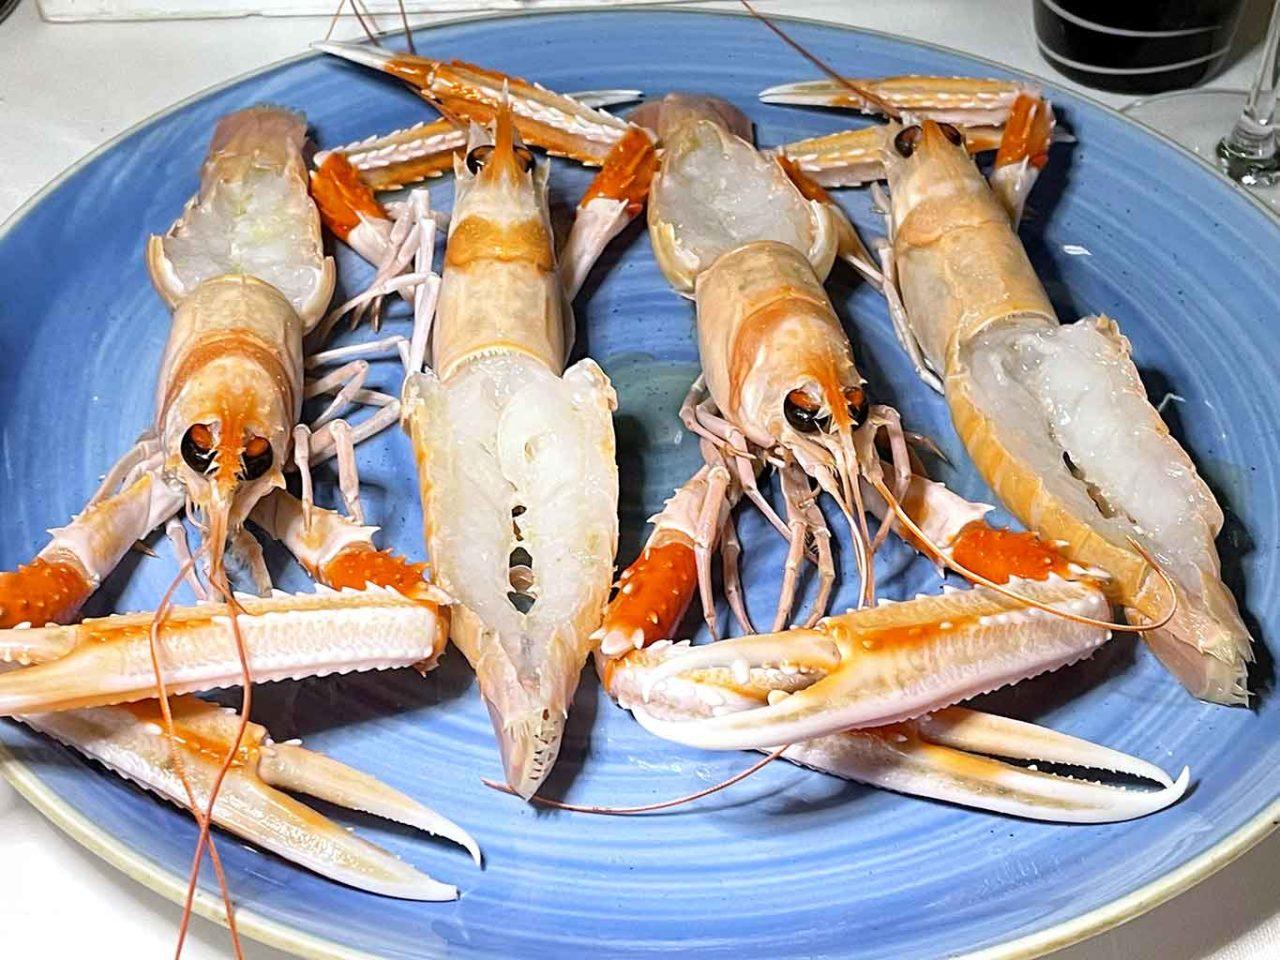 ristorante di pesce Pescheria Salerno scampi